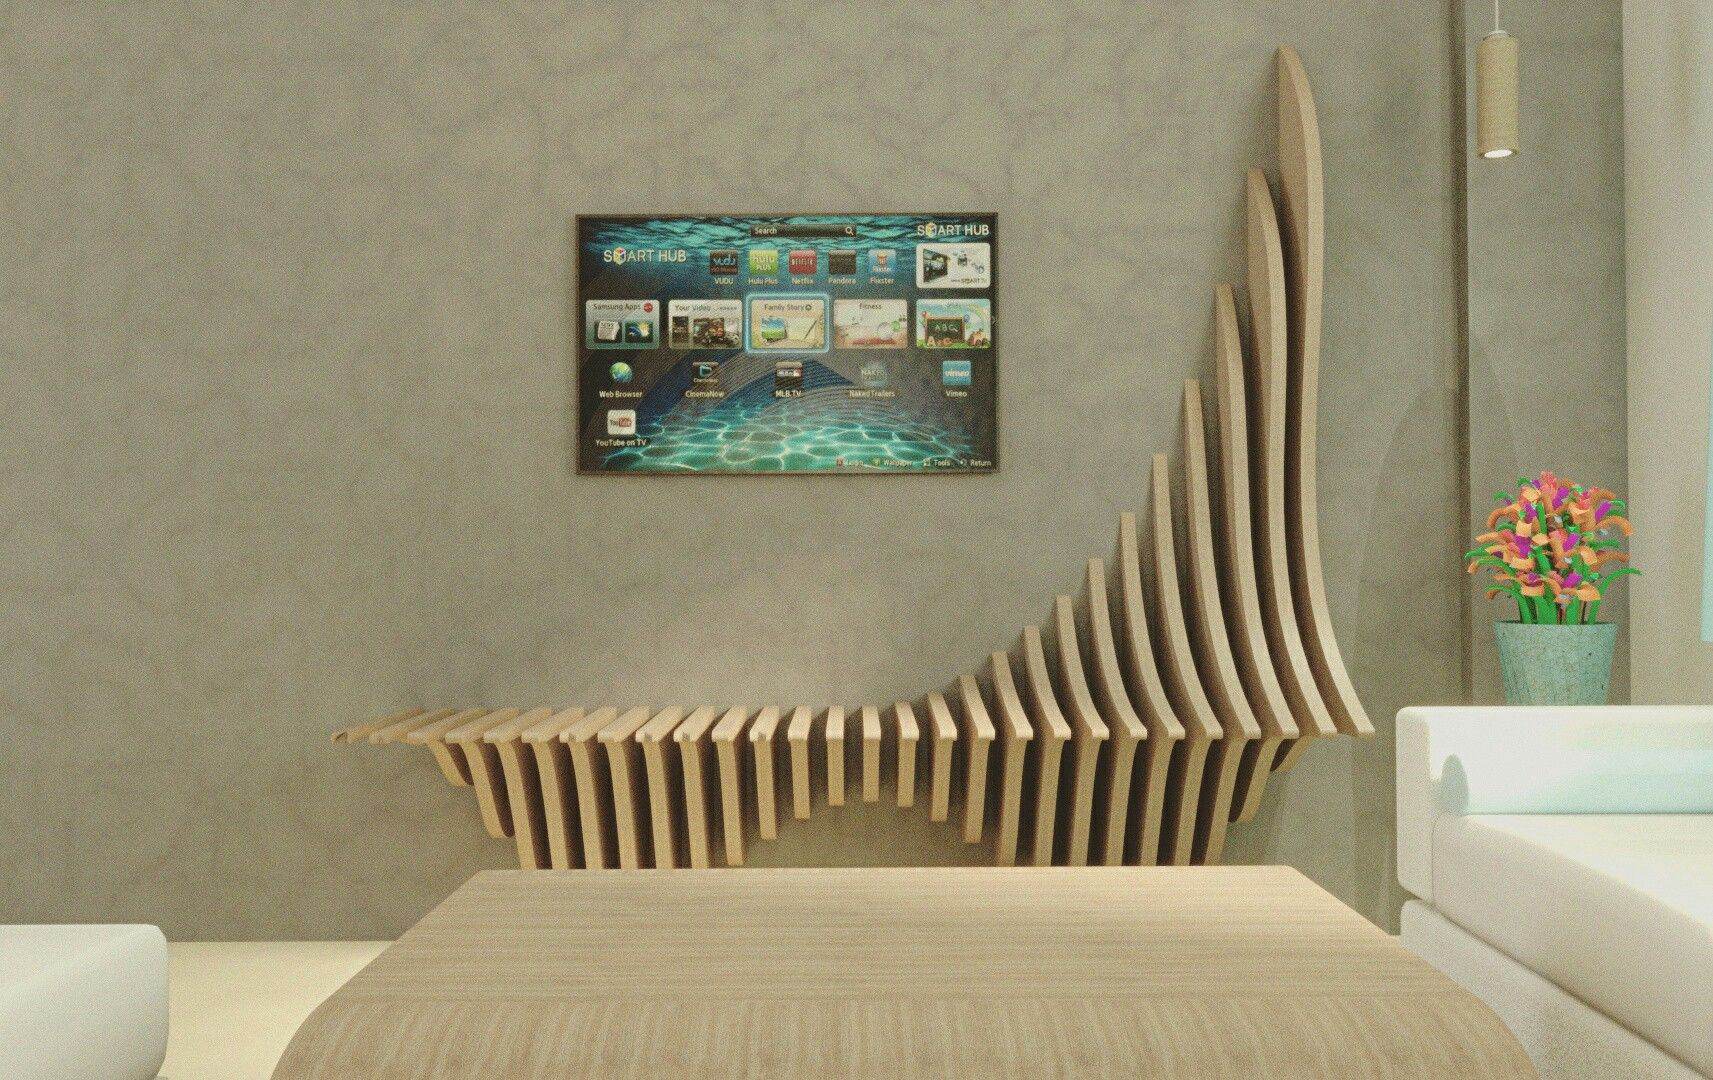 Parametric Furniture Design Tv Unit Design Using Grasshopper And